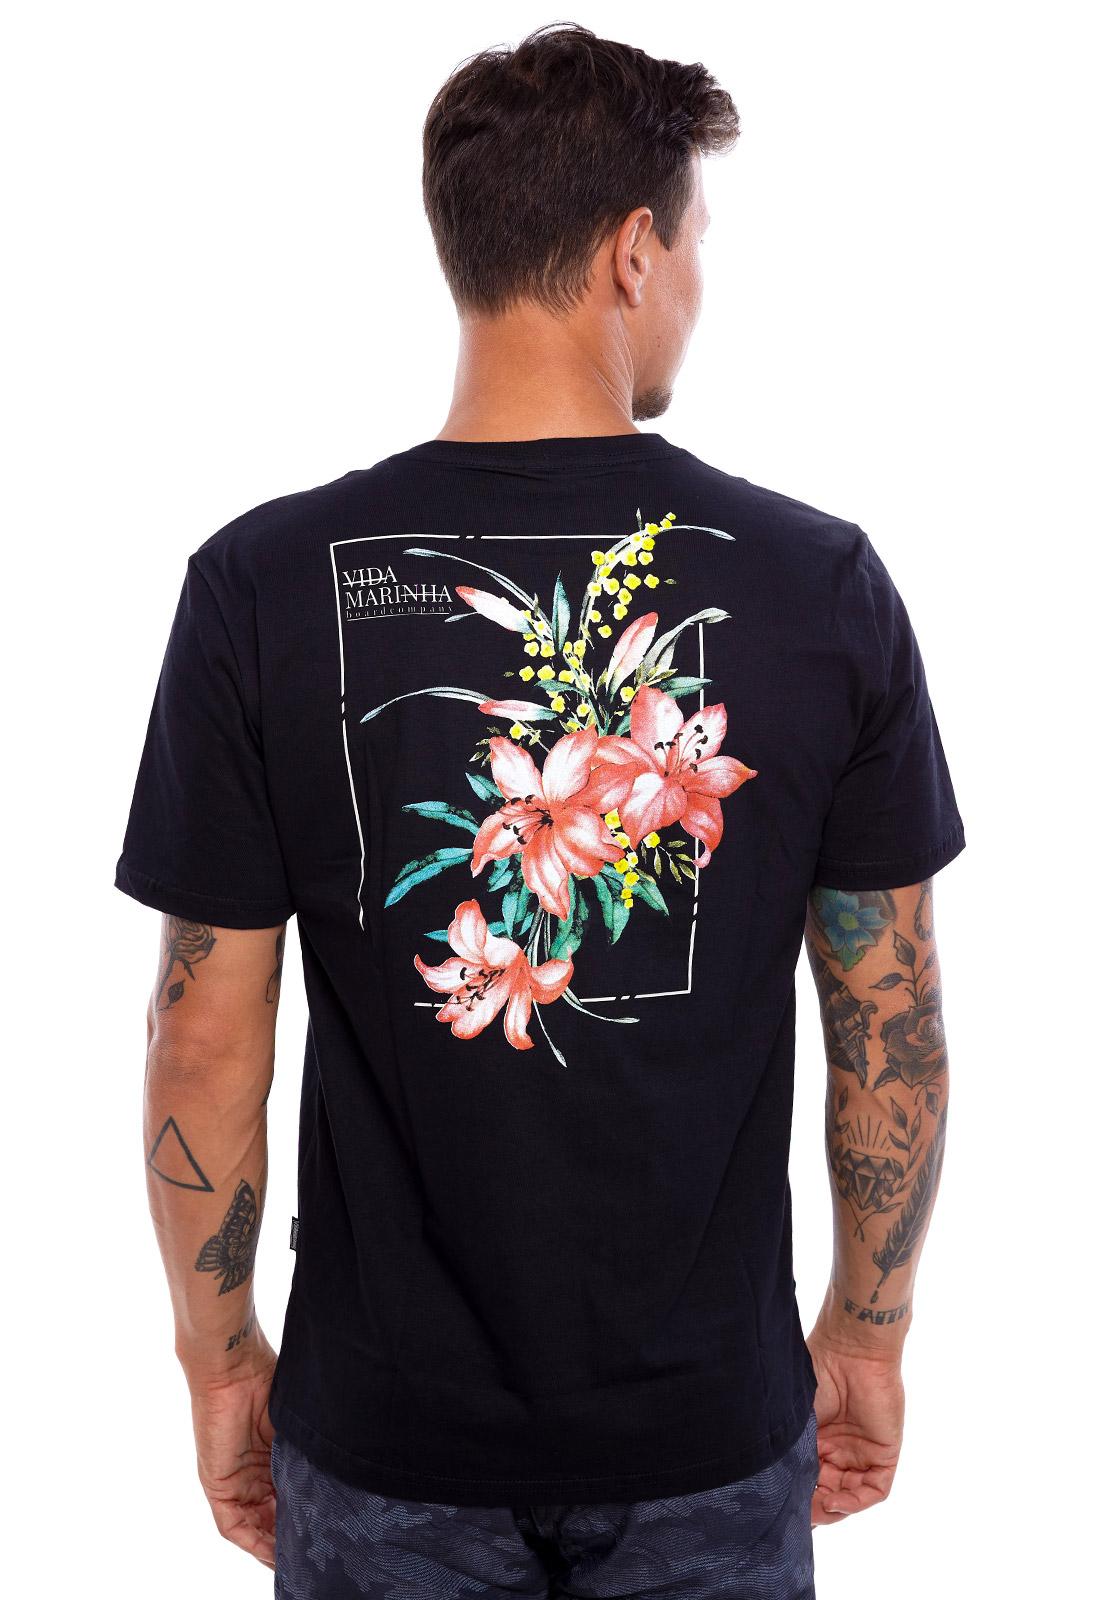 Camiseta Vida Marinha Manga Curta Preta